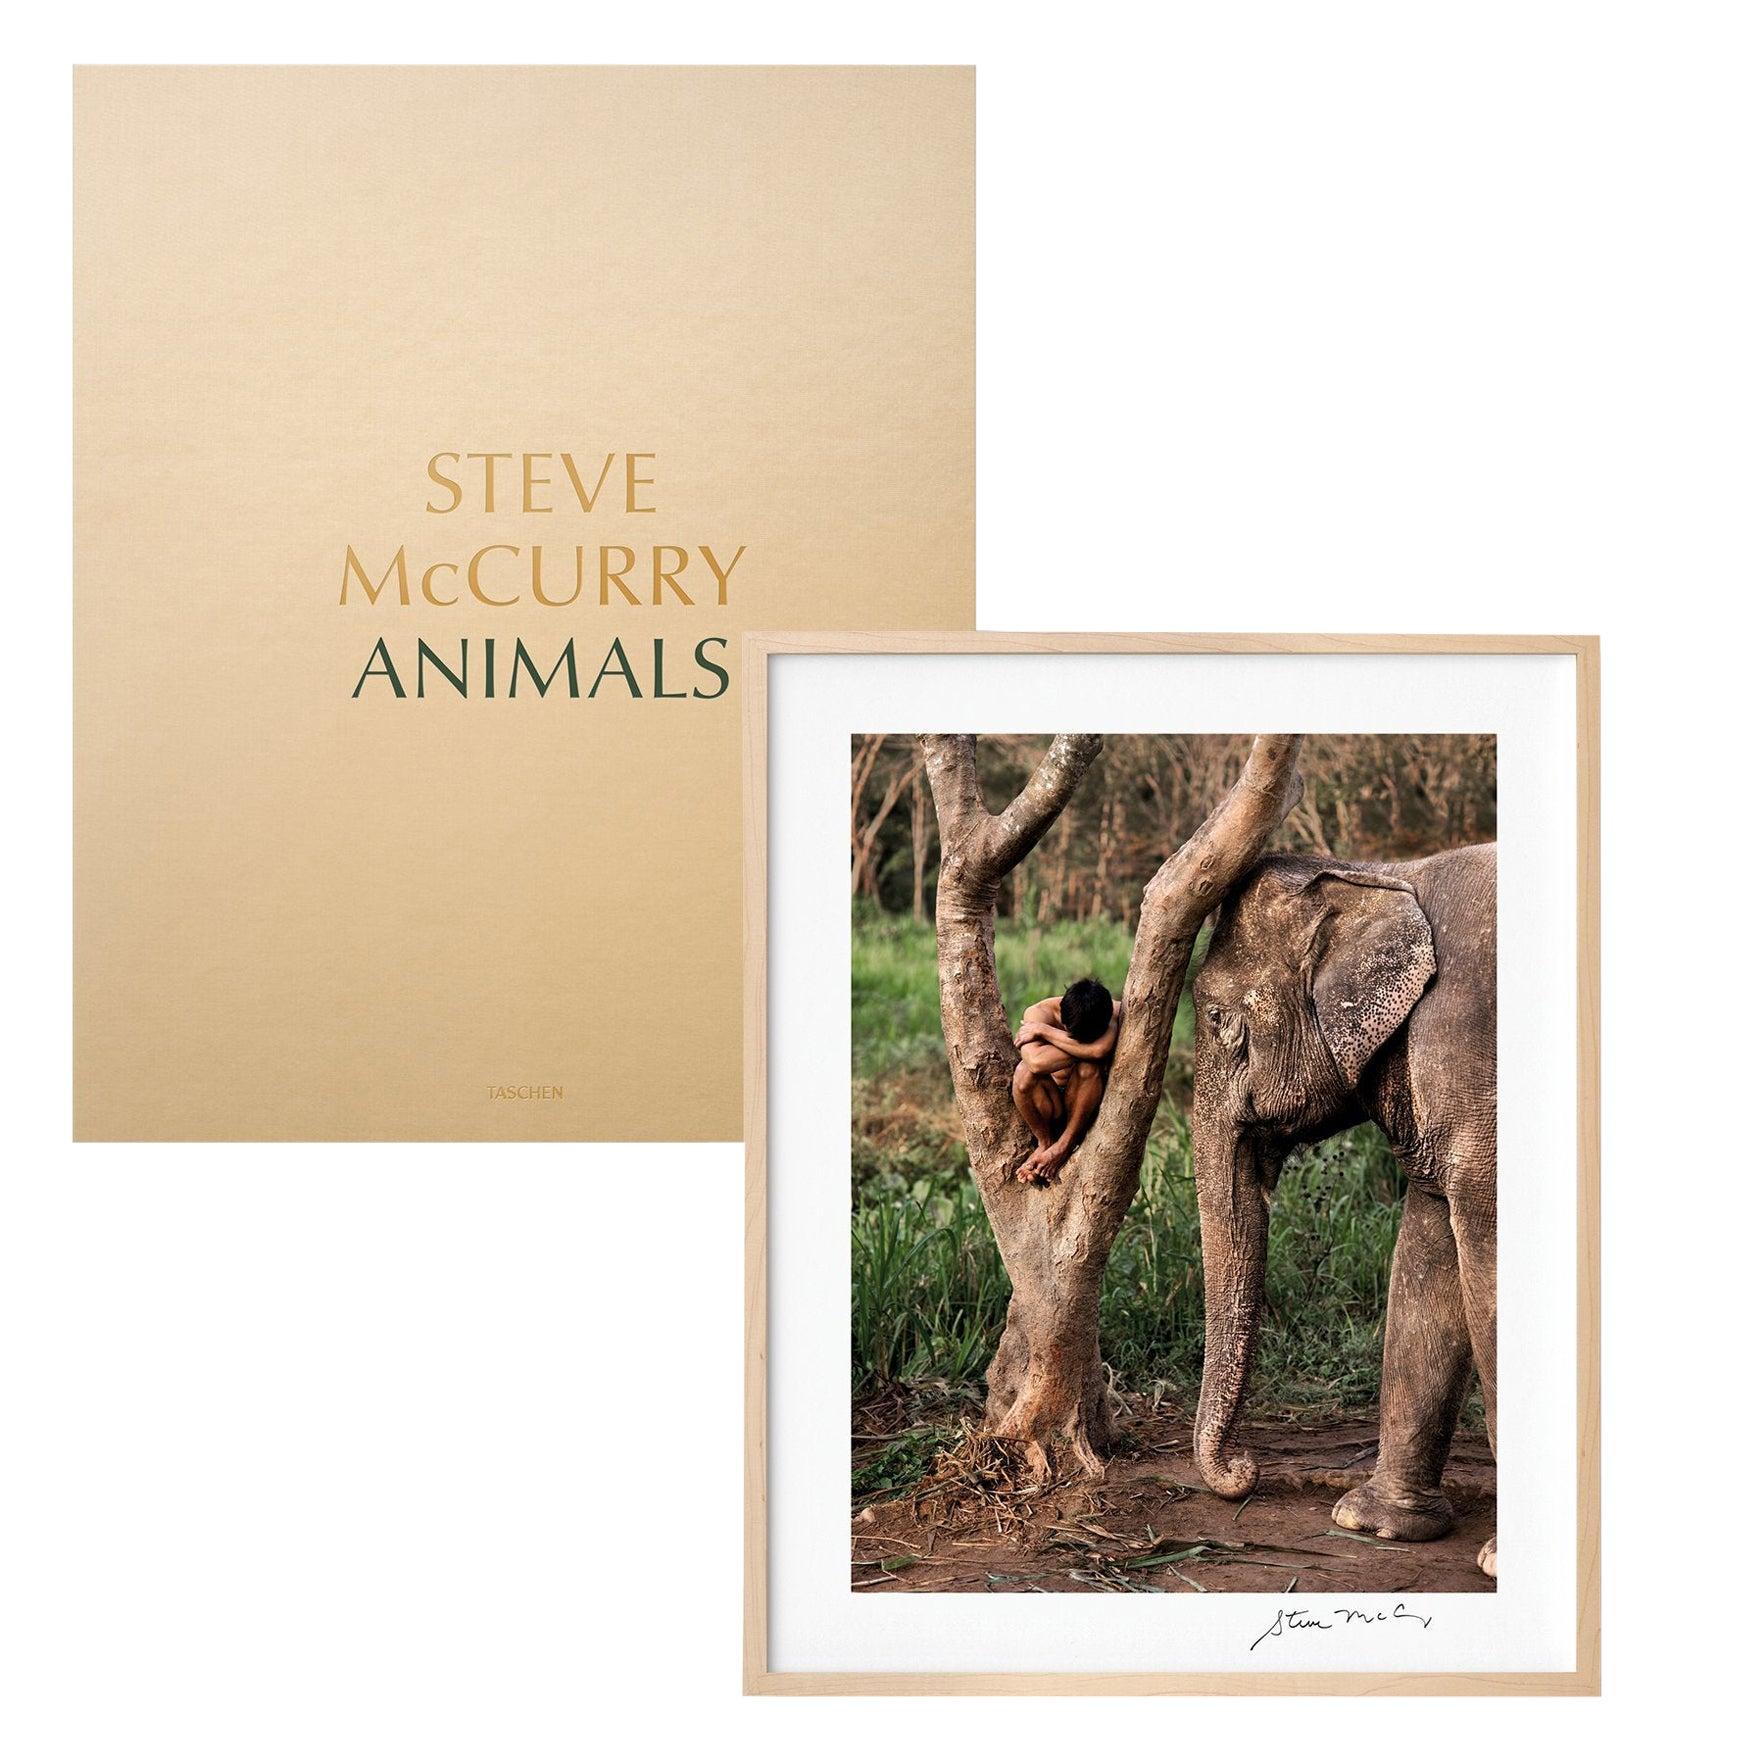 Steve McCurry, Animals, Art Edition No. 1-100 'Chiang Mai, Thailand, 2010'